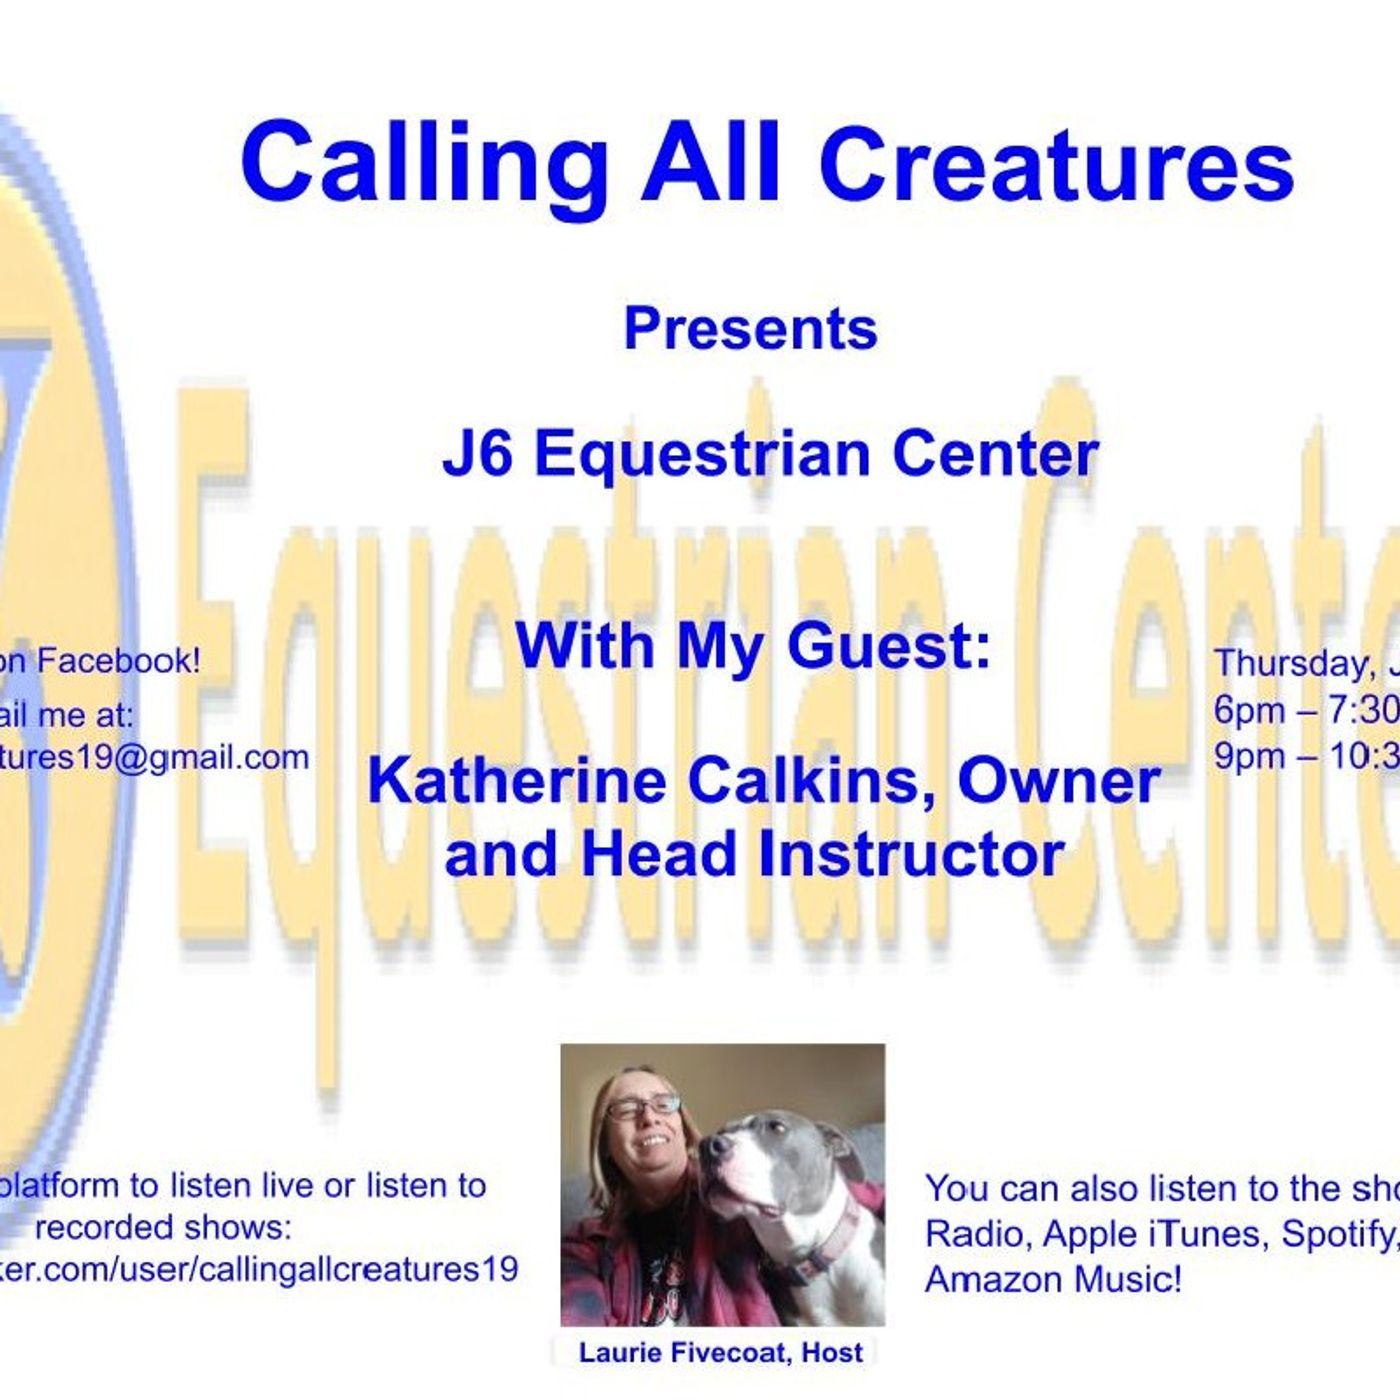 Calling All Creatures Presents J6 Equestrian Center